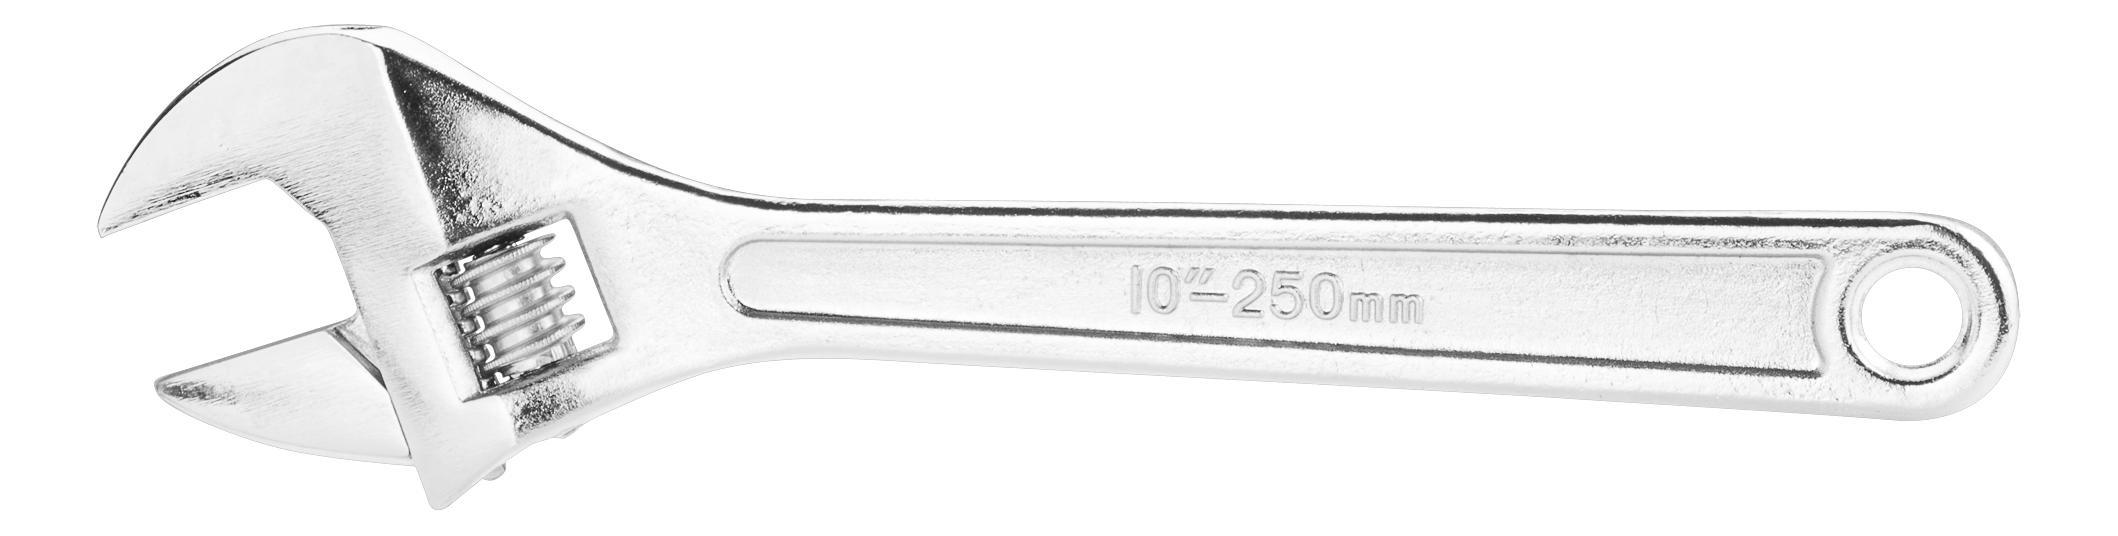 Ключ Top tools 35d113